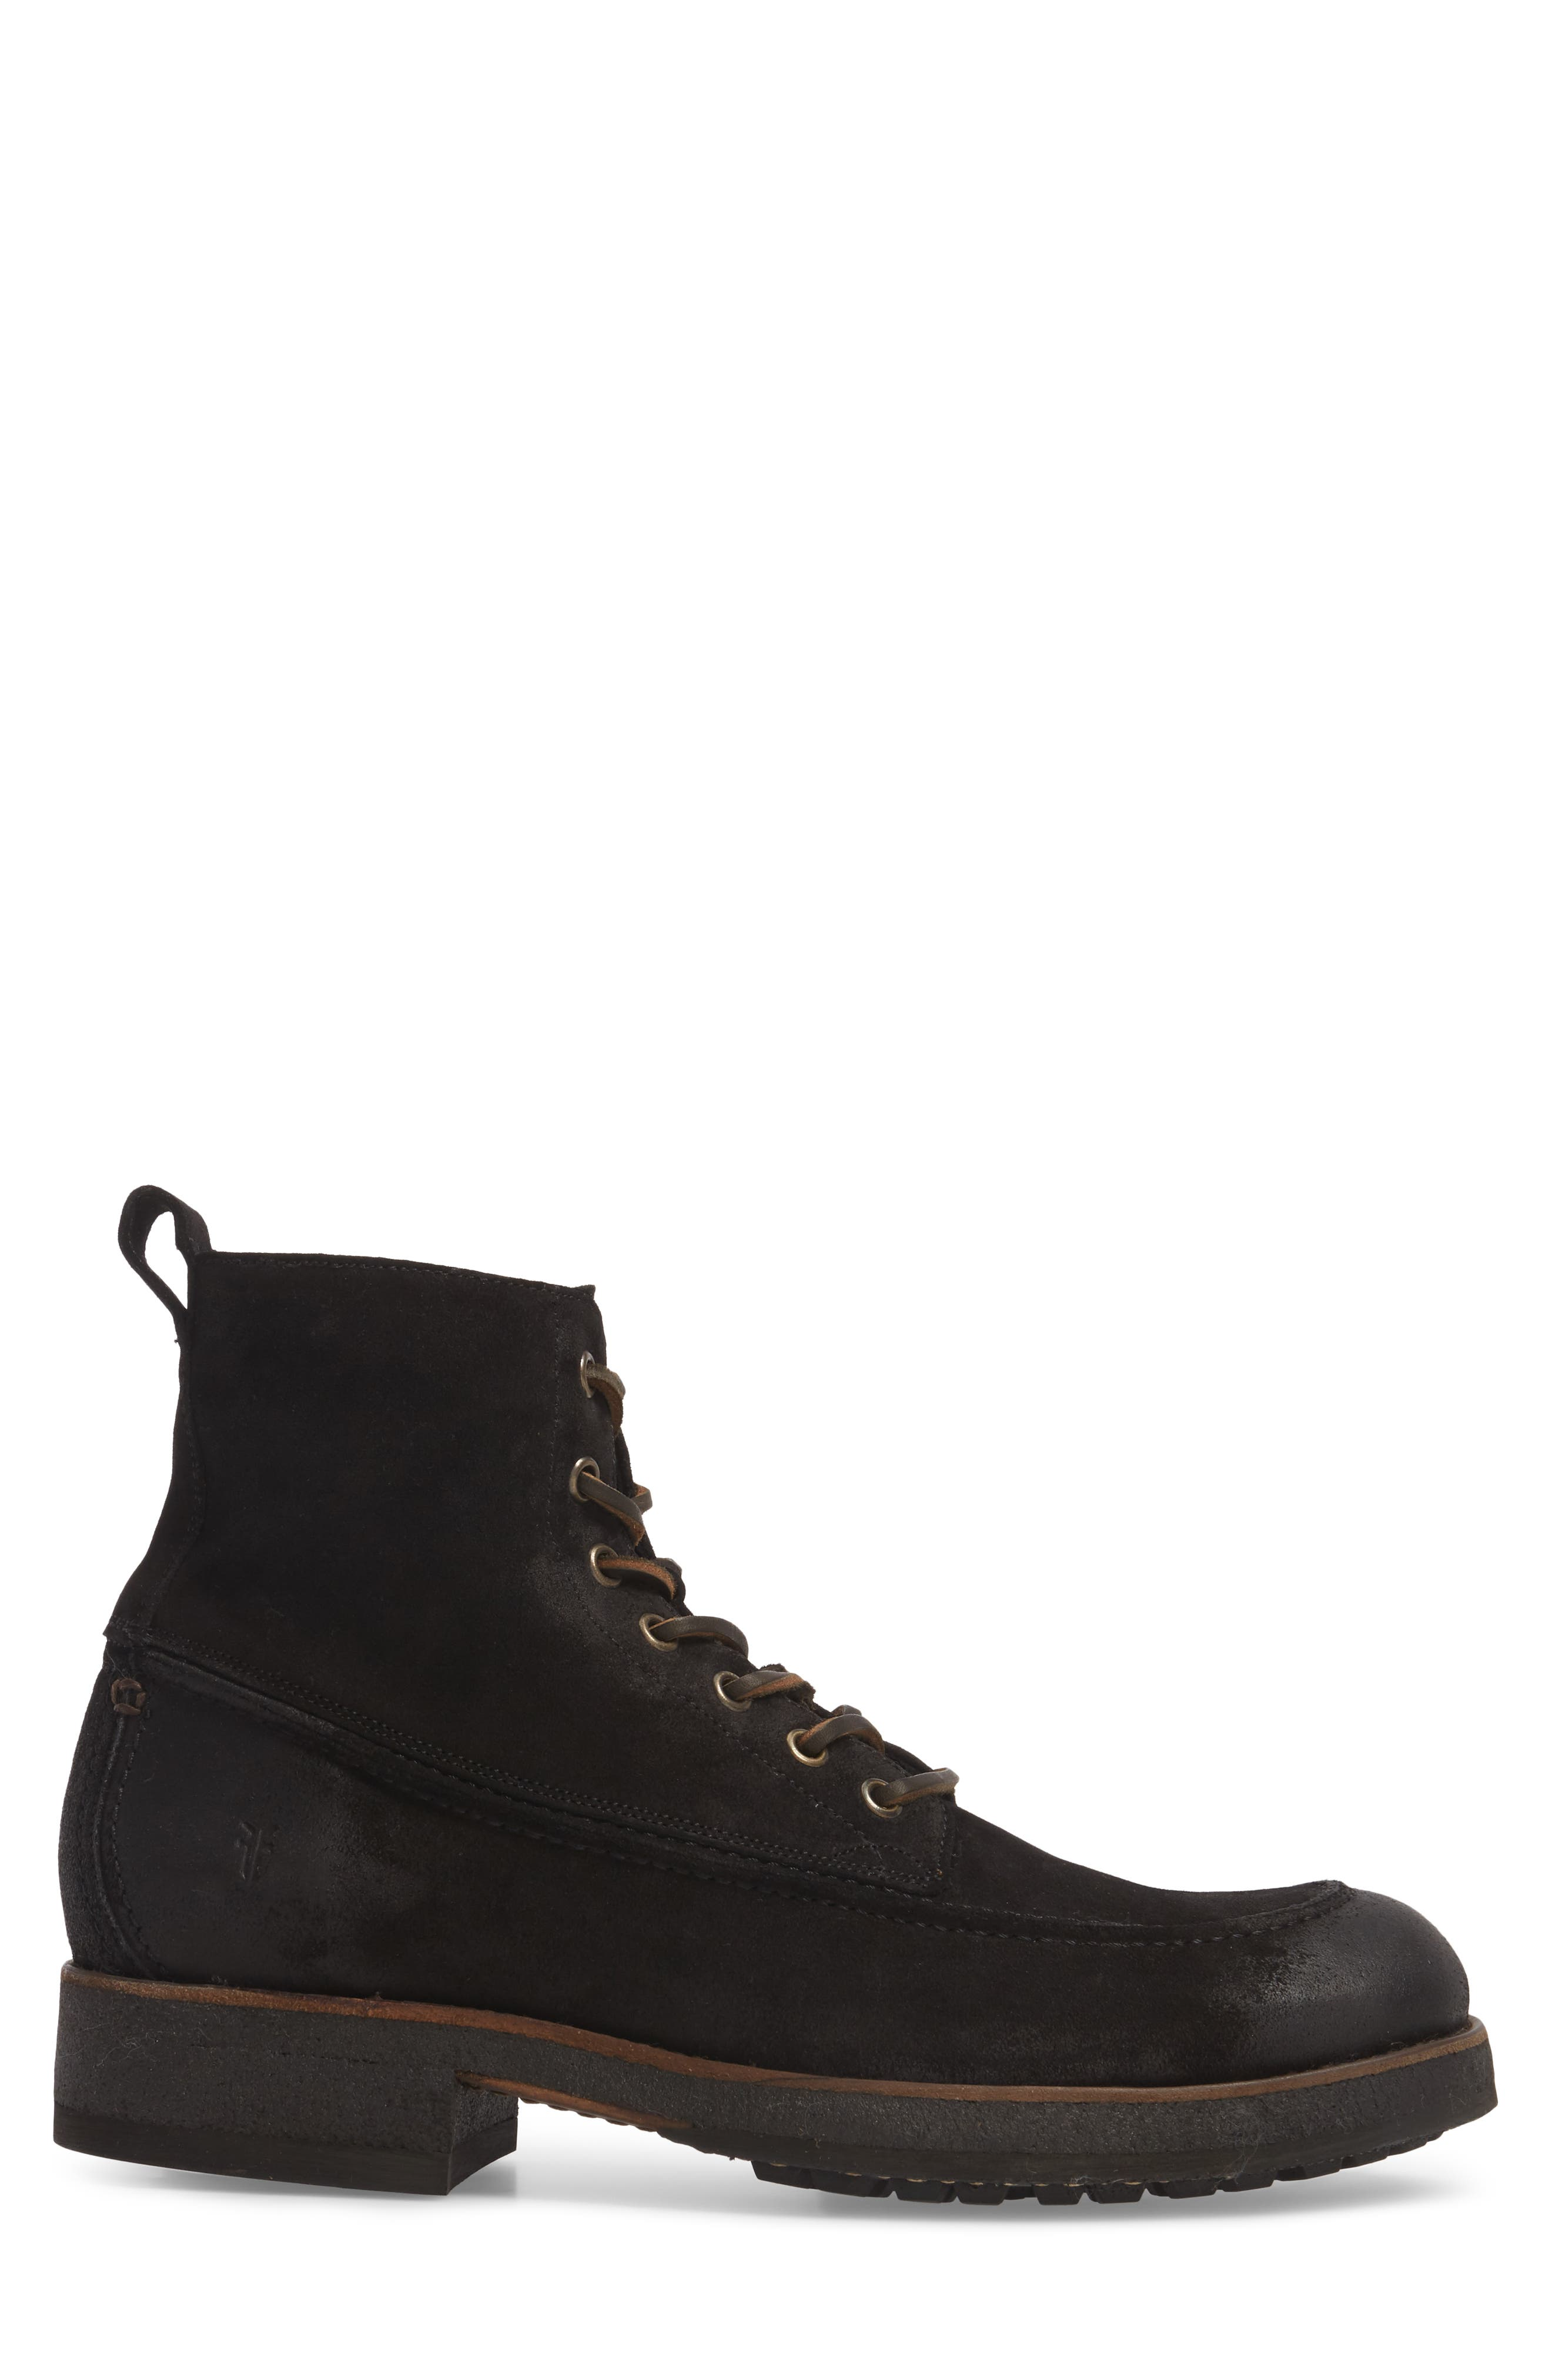 Rainier Waxed Work Boot,                             Alternate thumbnail 3, color,                             Black Waxed Suede